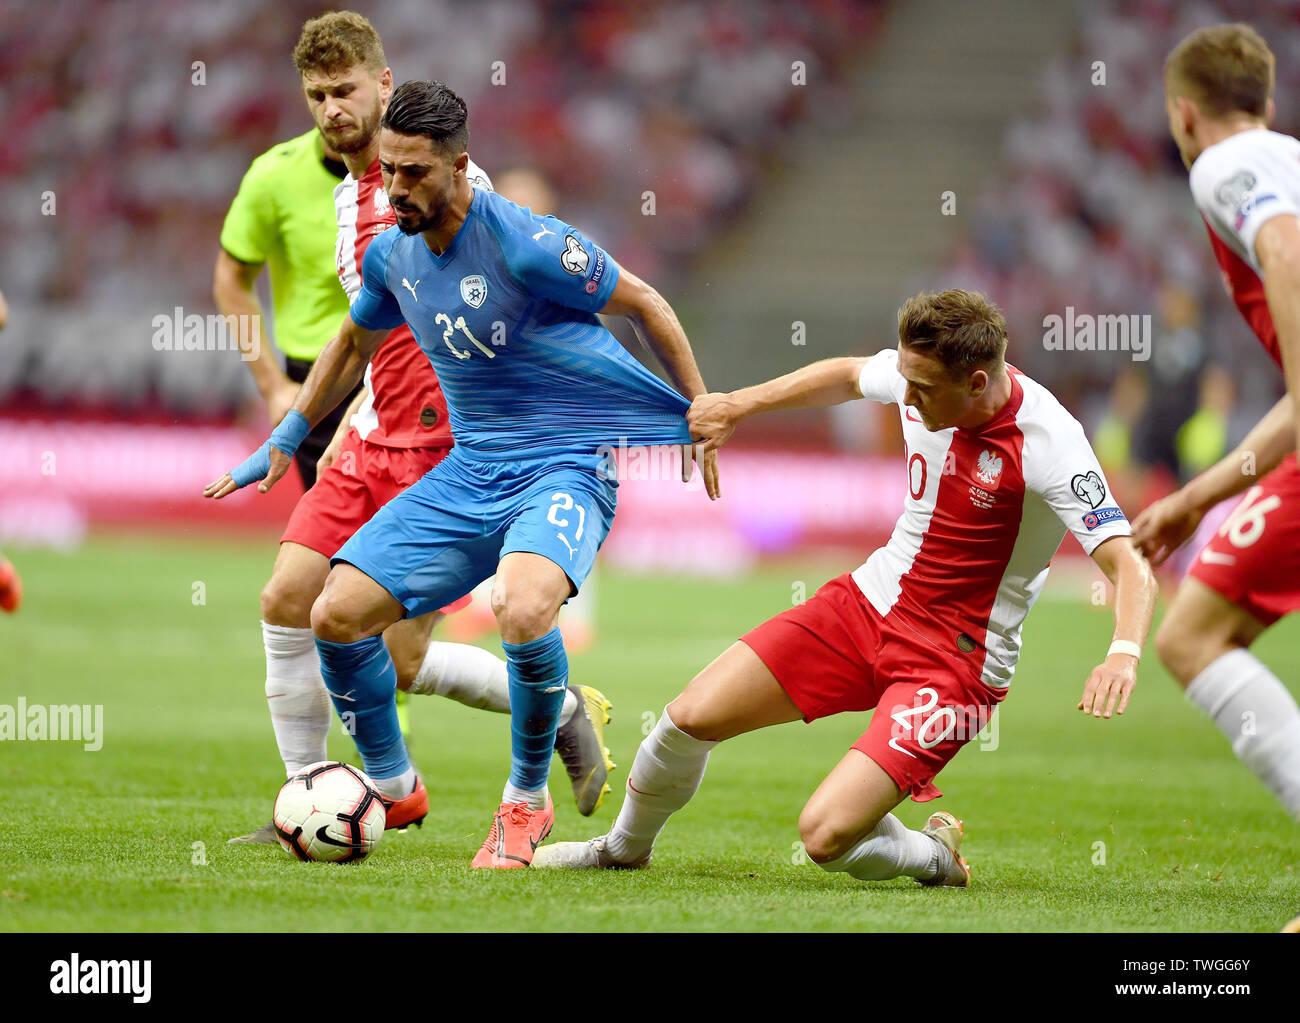 Warsaw, Poland, June 10, 2019: EURO 2020 qualifing round, group stage, Poland wins 4:0 with Izarel on PGE Narodowy. Mateusz Klich (Poland) Beram Kayal (Izrael) Piotr Zielinski (Poland) - Stock Image